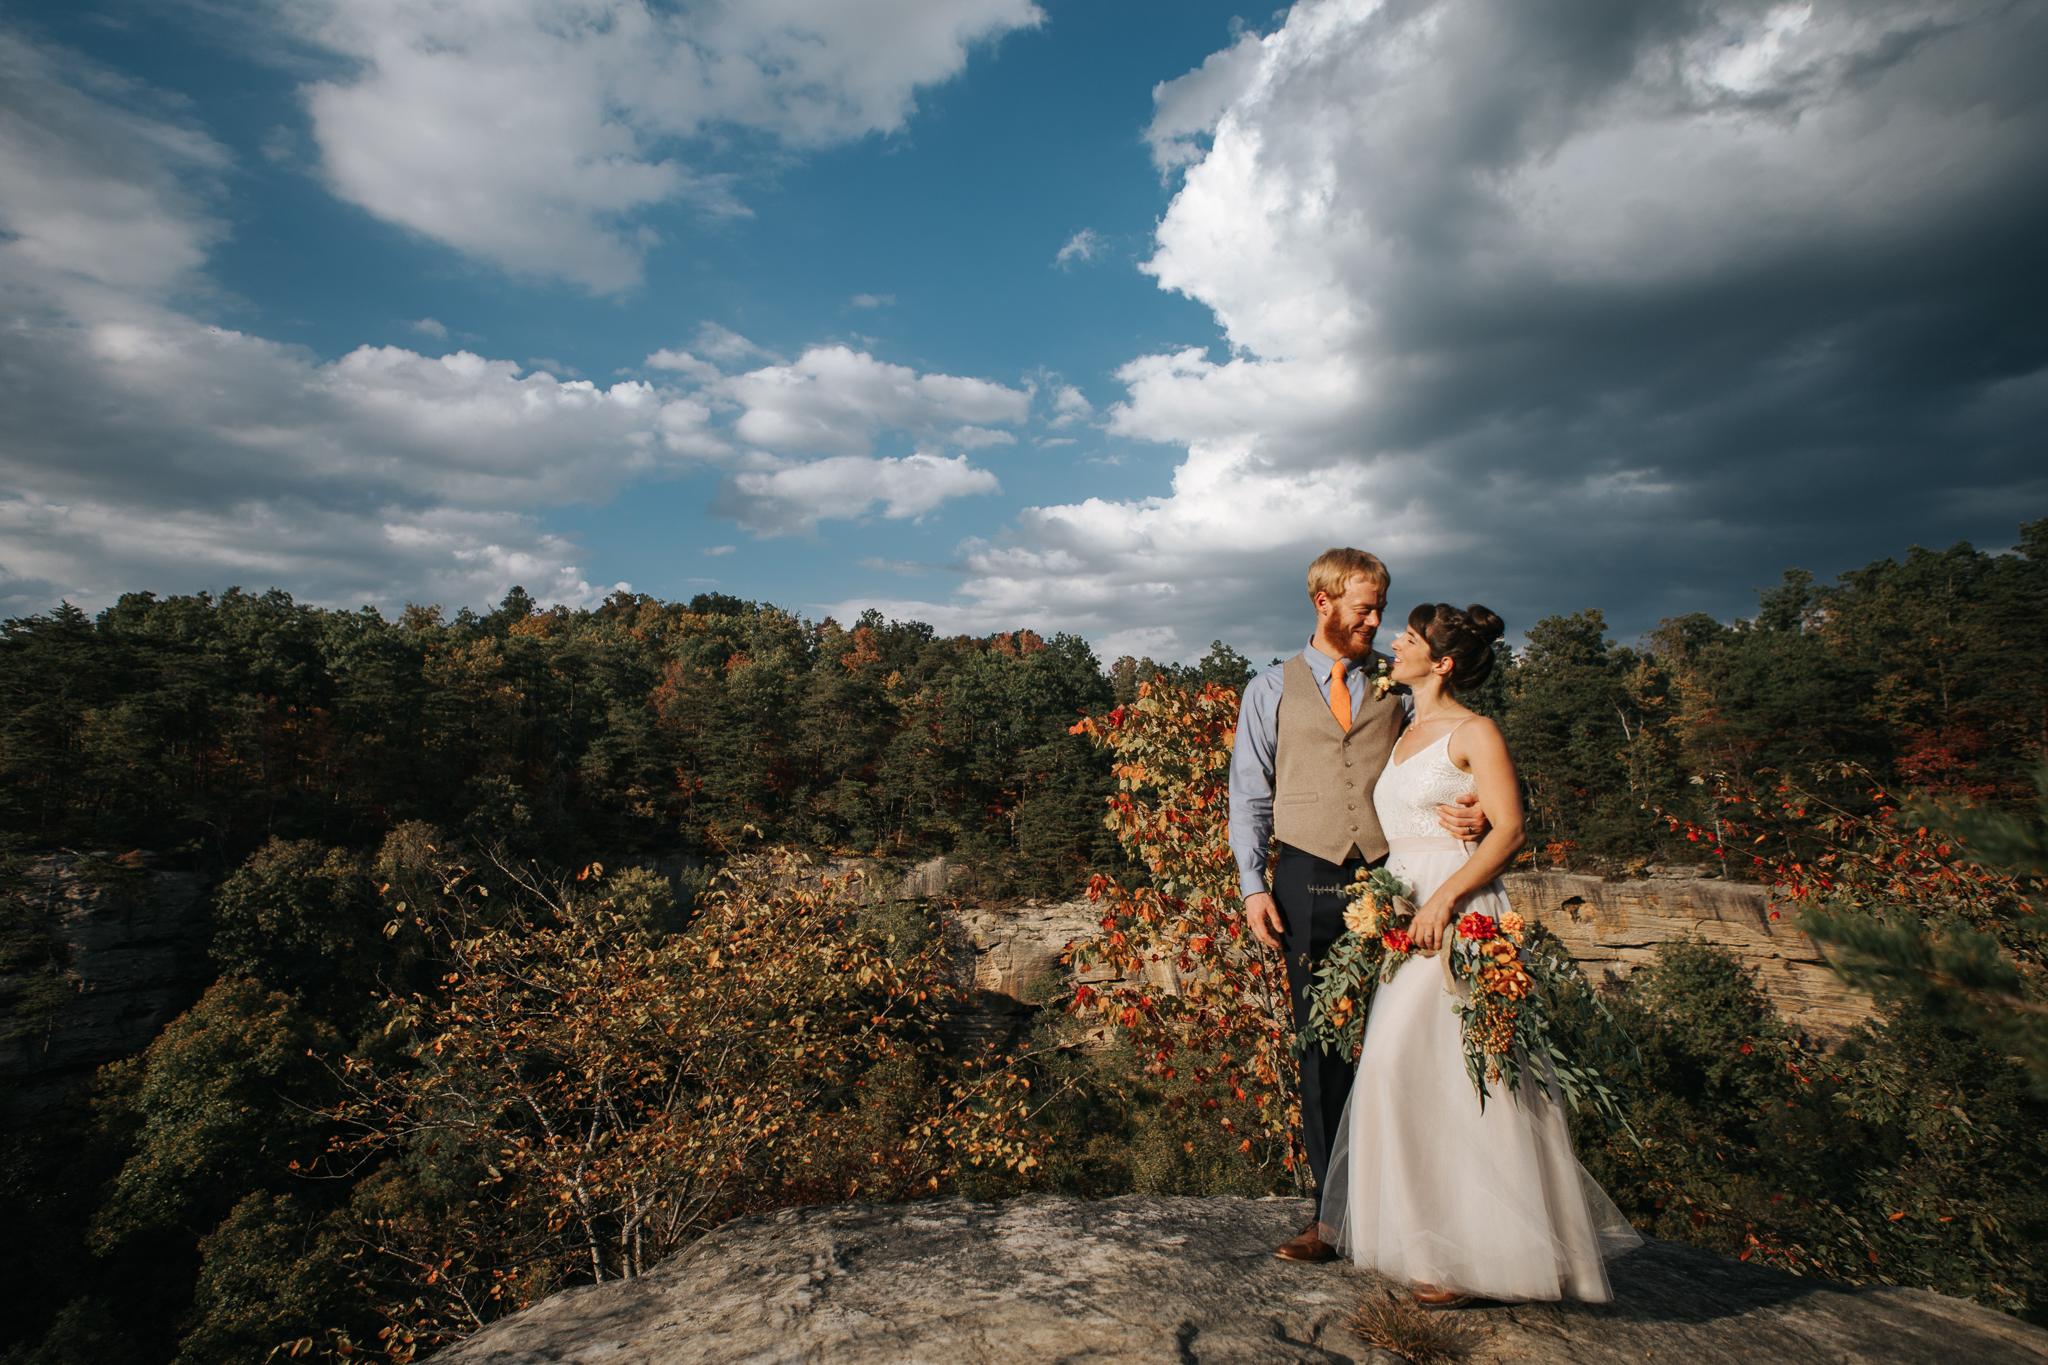 Richmond Kentucky Wedding Photographer - Ariana Jordan Photography -32-2.jpg